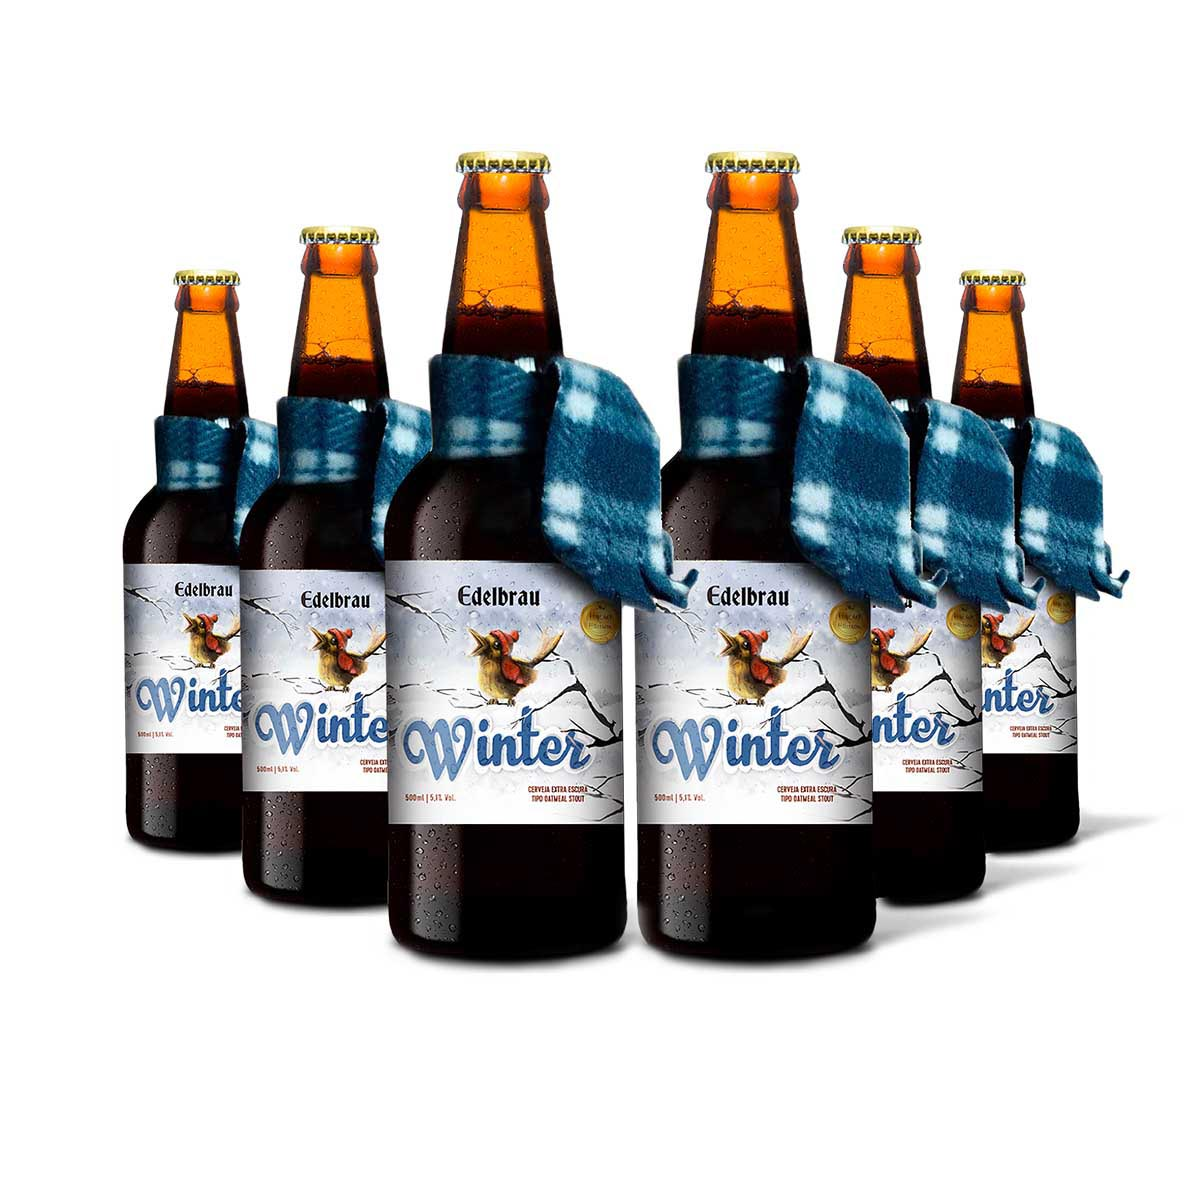 Pack Edelbrau Stout Winter 6 cervejas 500 ml  - RS BEER - Cervejas Gaúchas